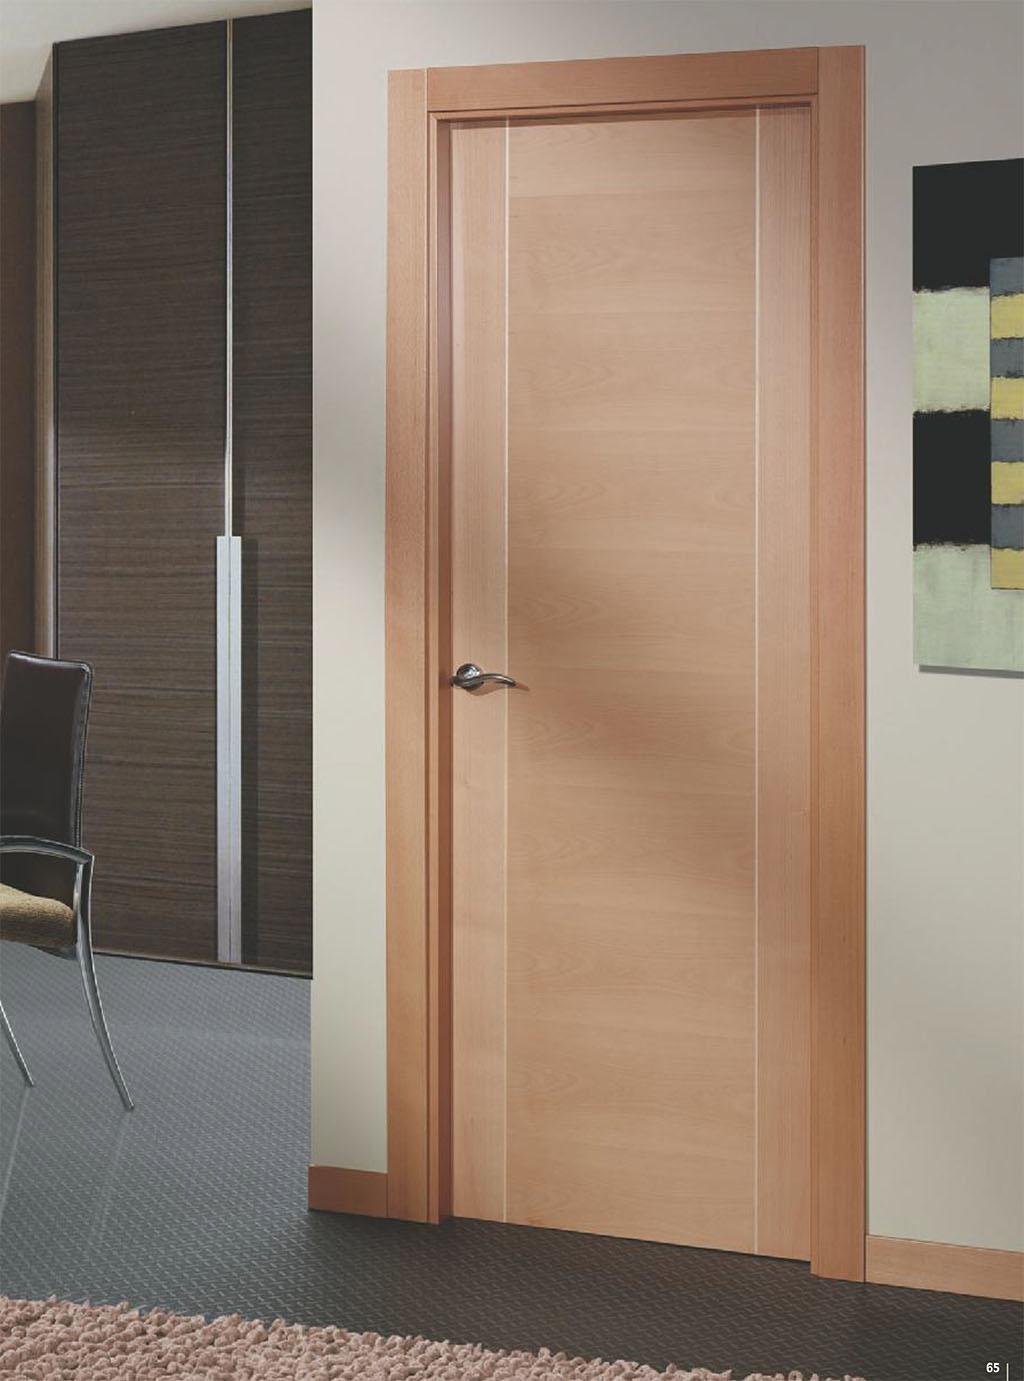 Puertas de madera modernas para interiores resultado de for Puertas interiores modernas